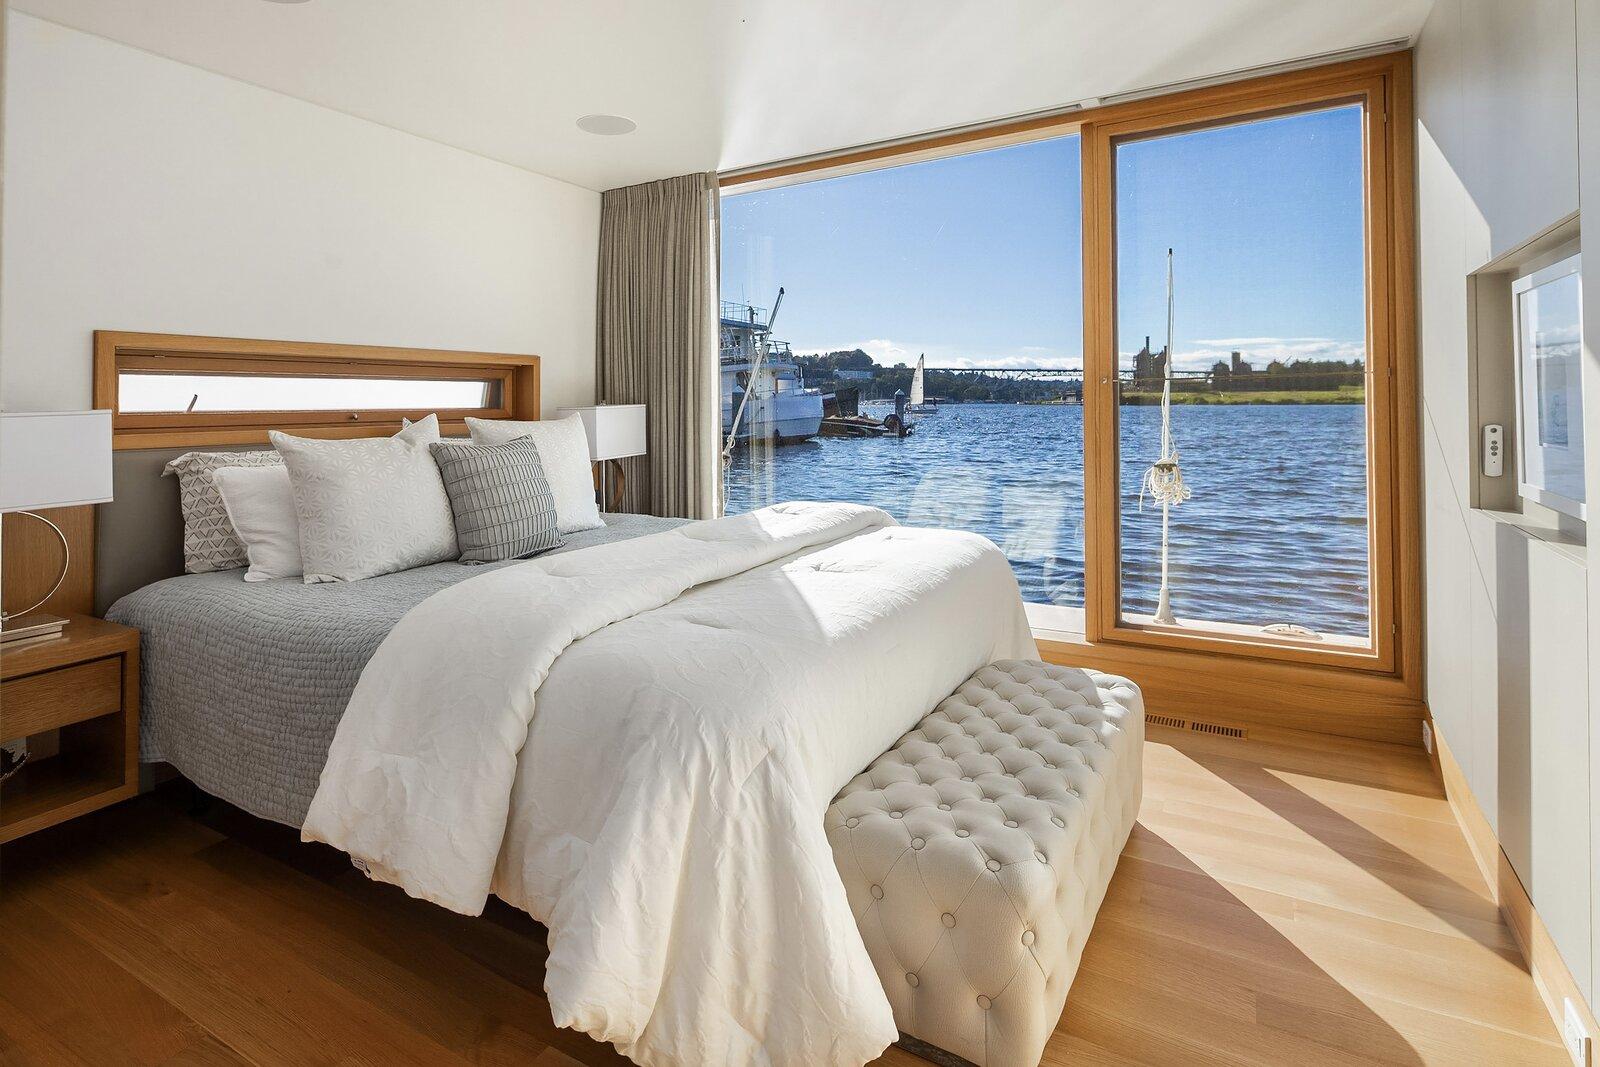 Vandeventer + Carlander floating home bedroom